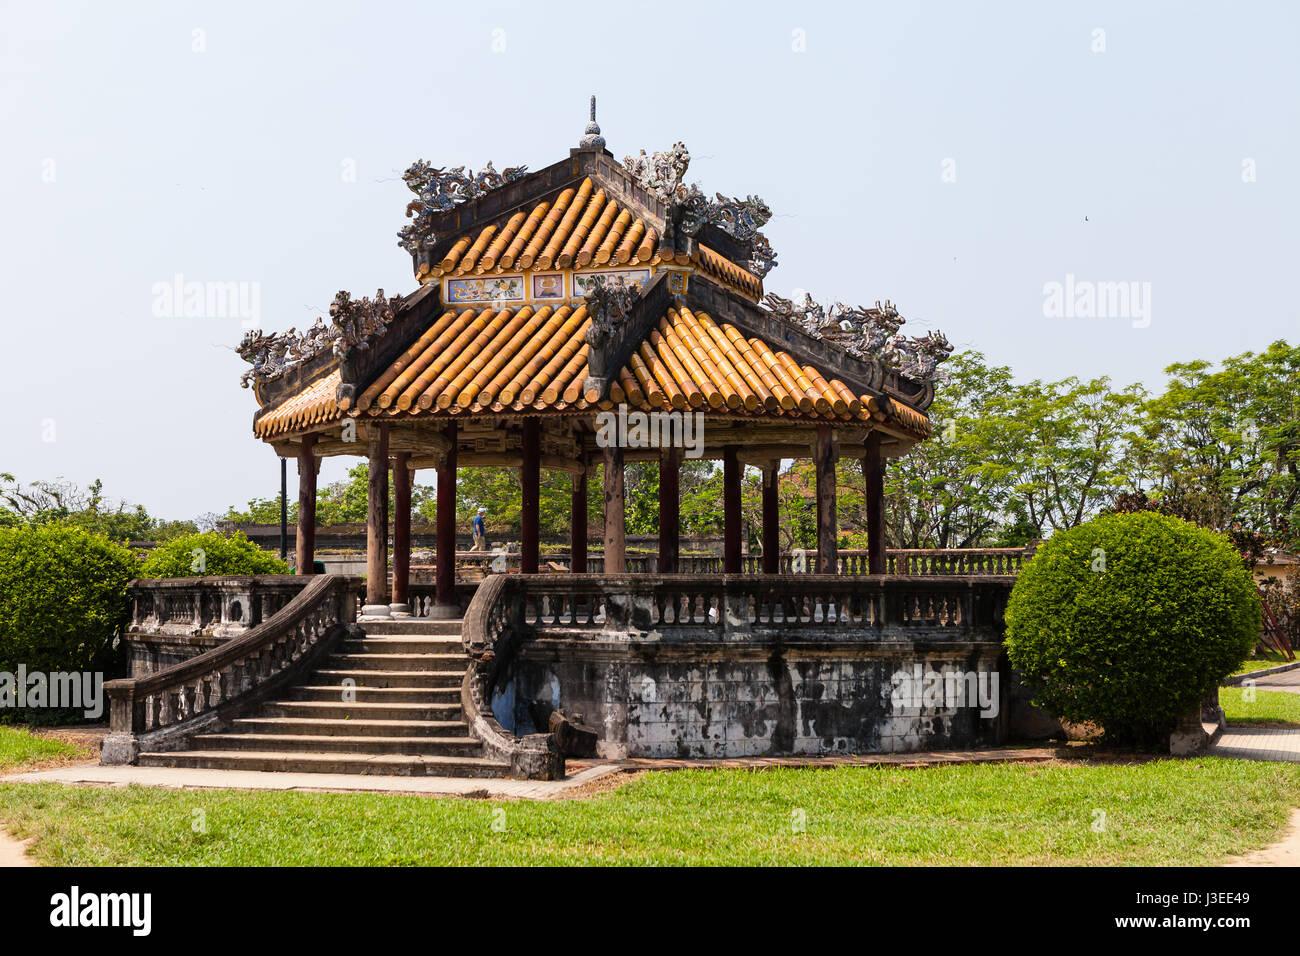 Hoi An, Vietnam - march 10 2017: Imperial Citadel (Imperial City), Hue, Vietnam Stock Photo